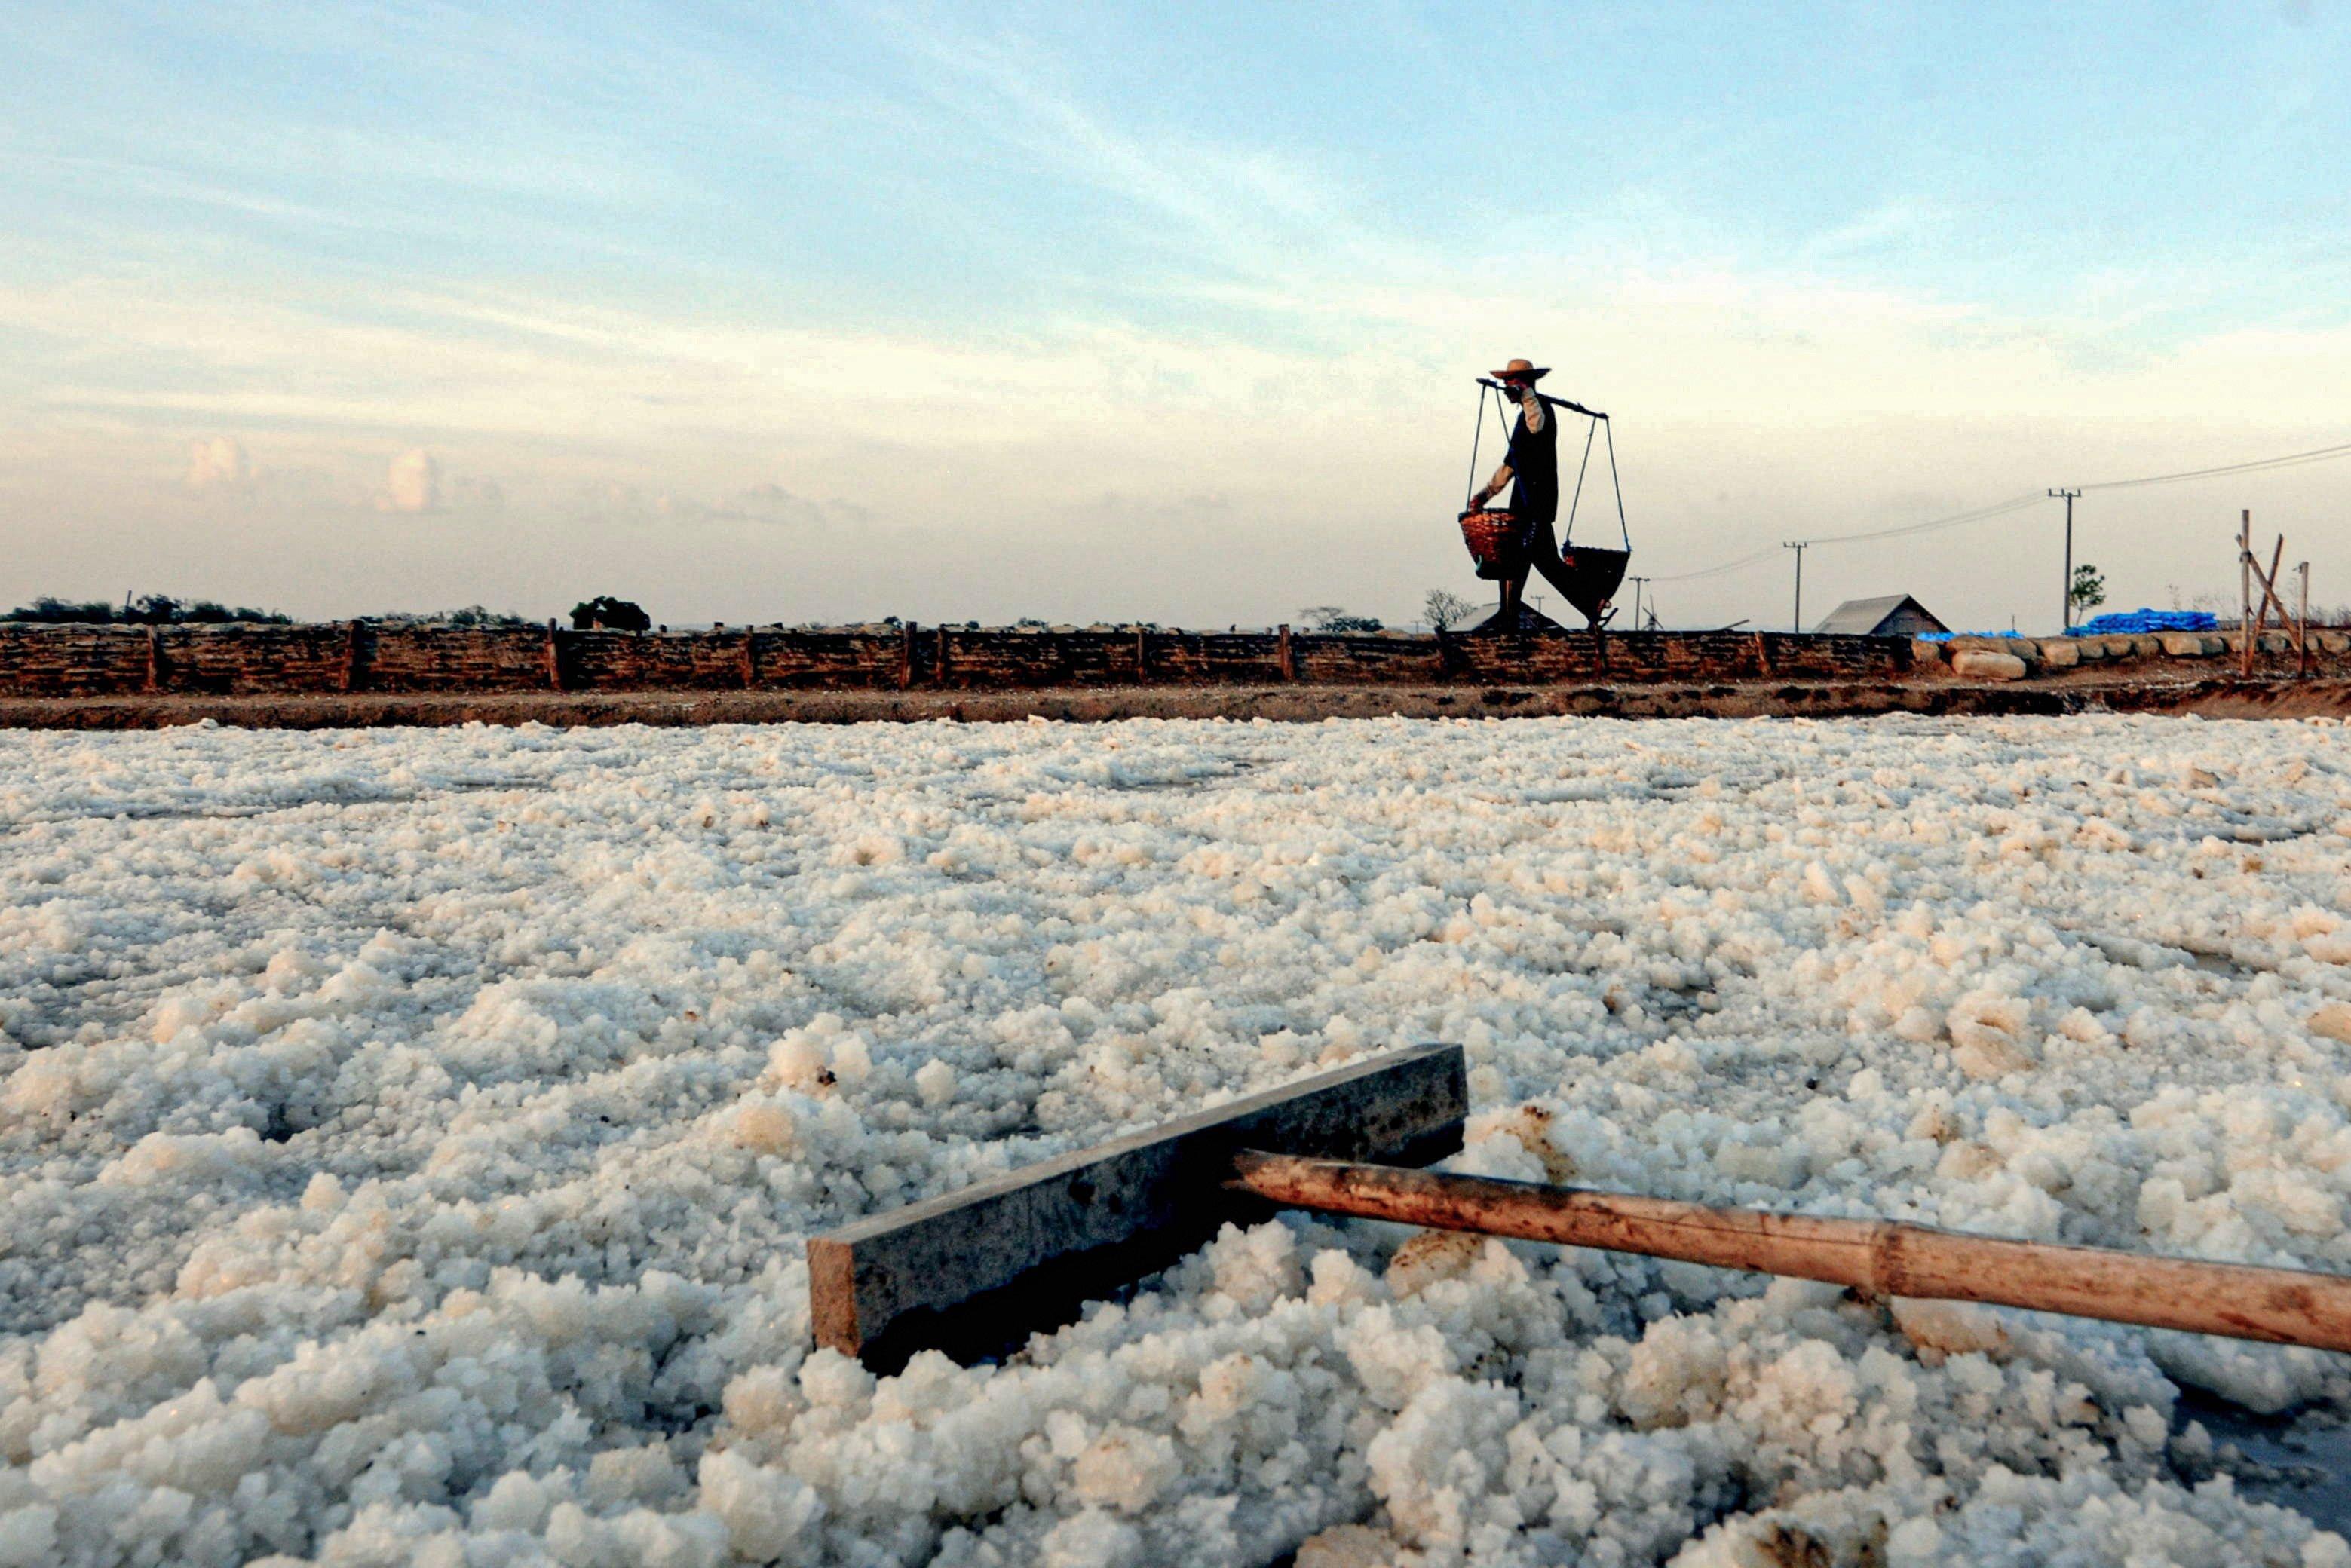 Petani memanen garam di Desa Bunder, Pademawu, Pamekasan, Jawa Timur.\r\n